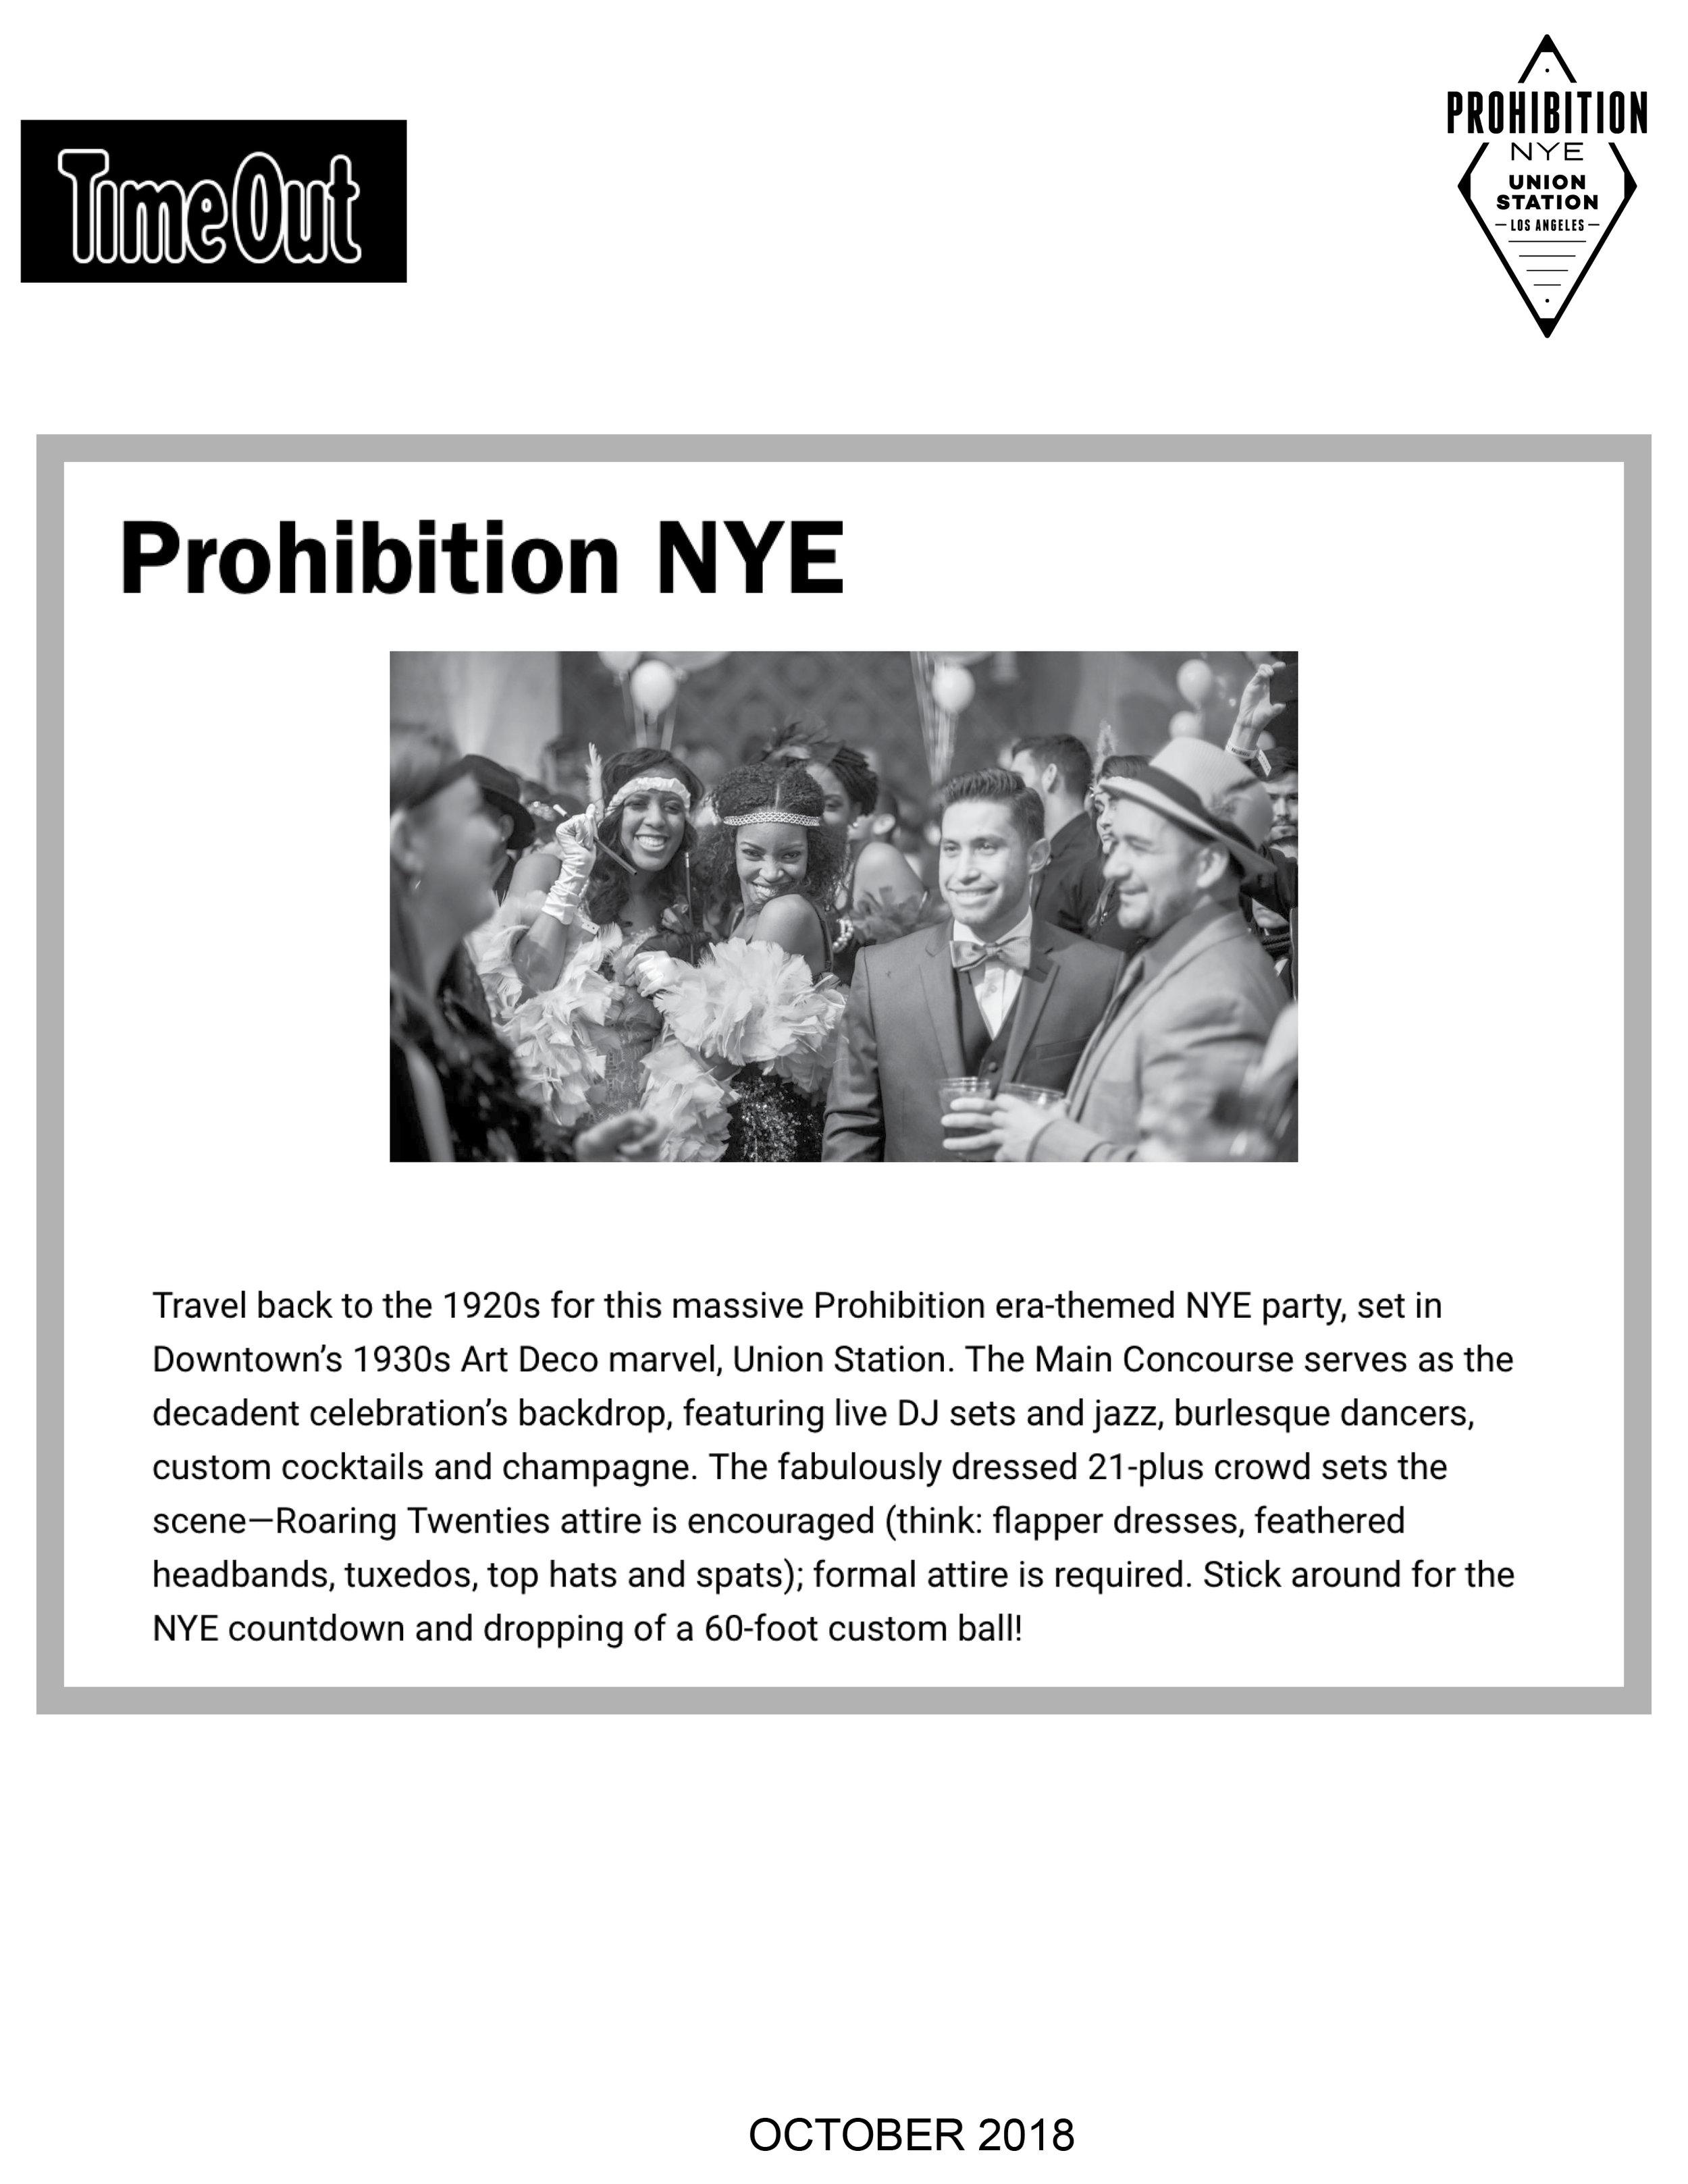 ProhibitionNYE_TimeOut_October2018.jpg